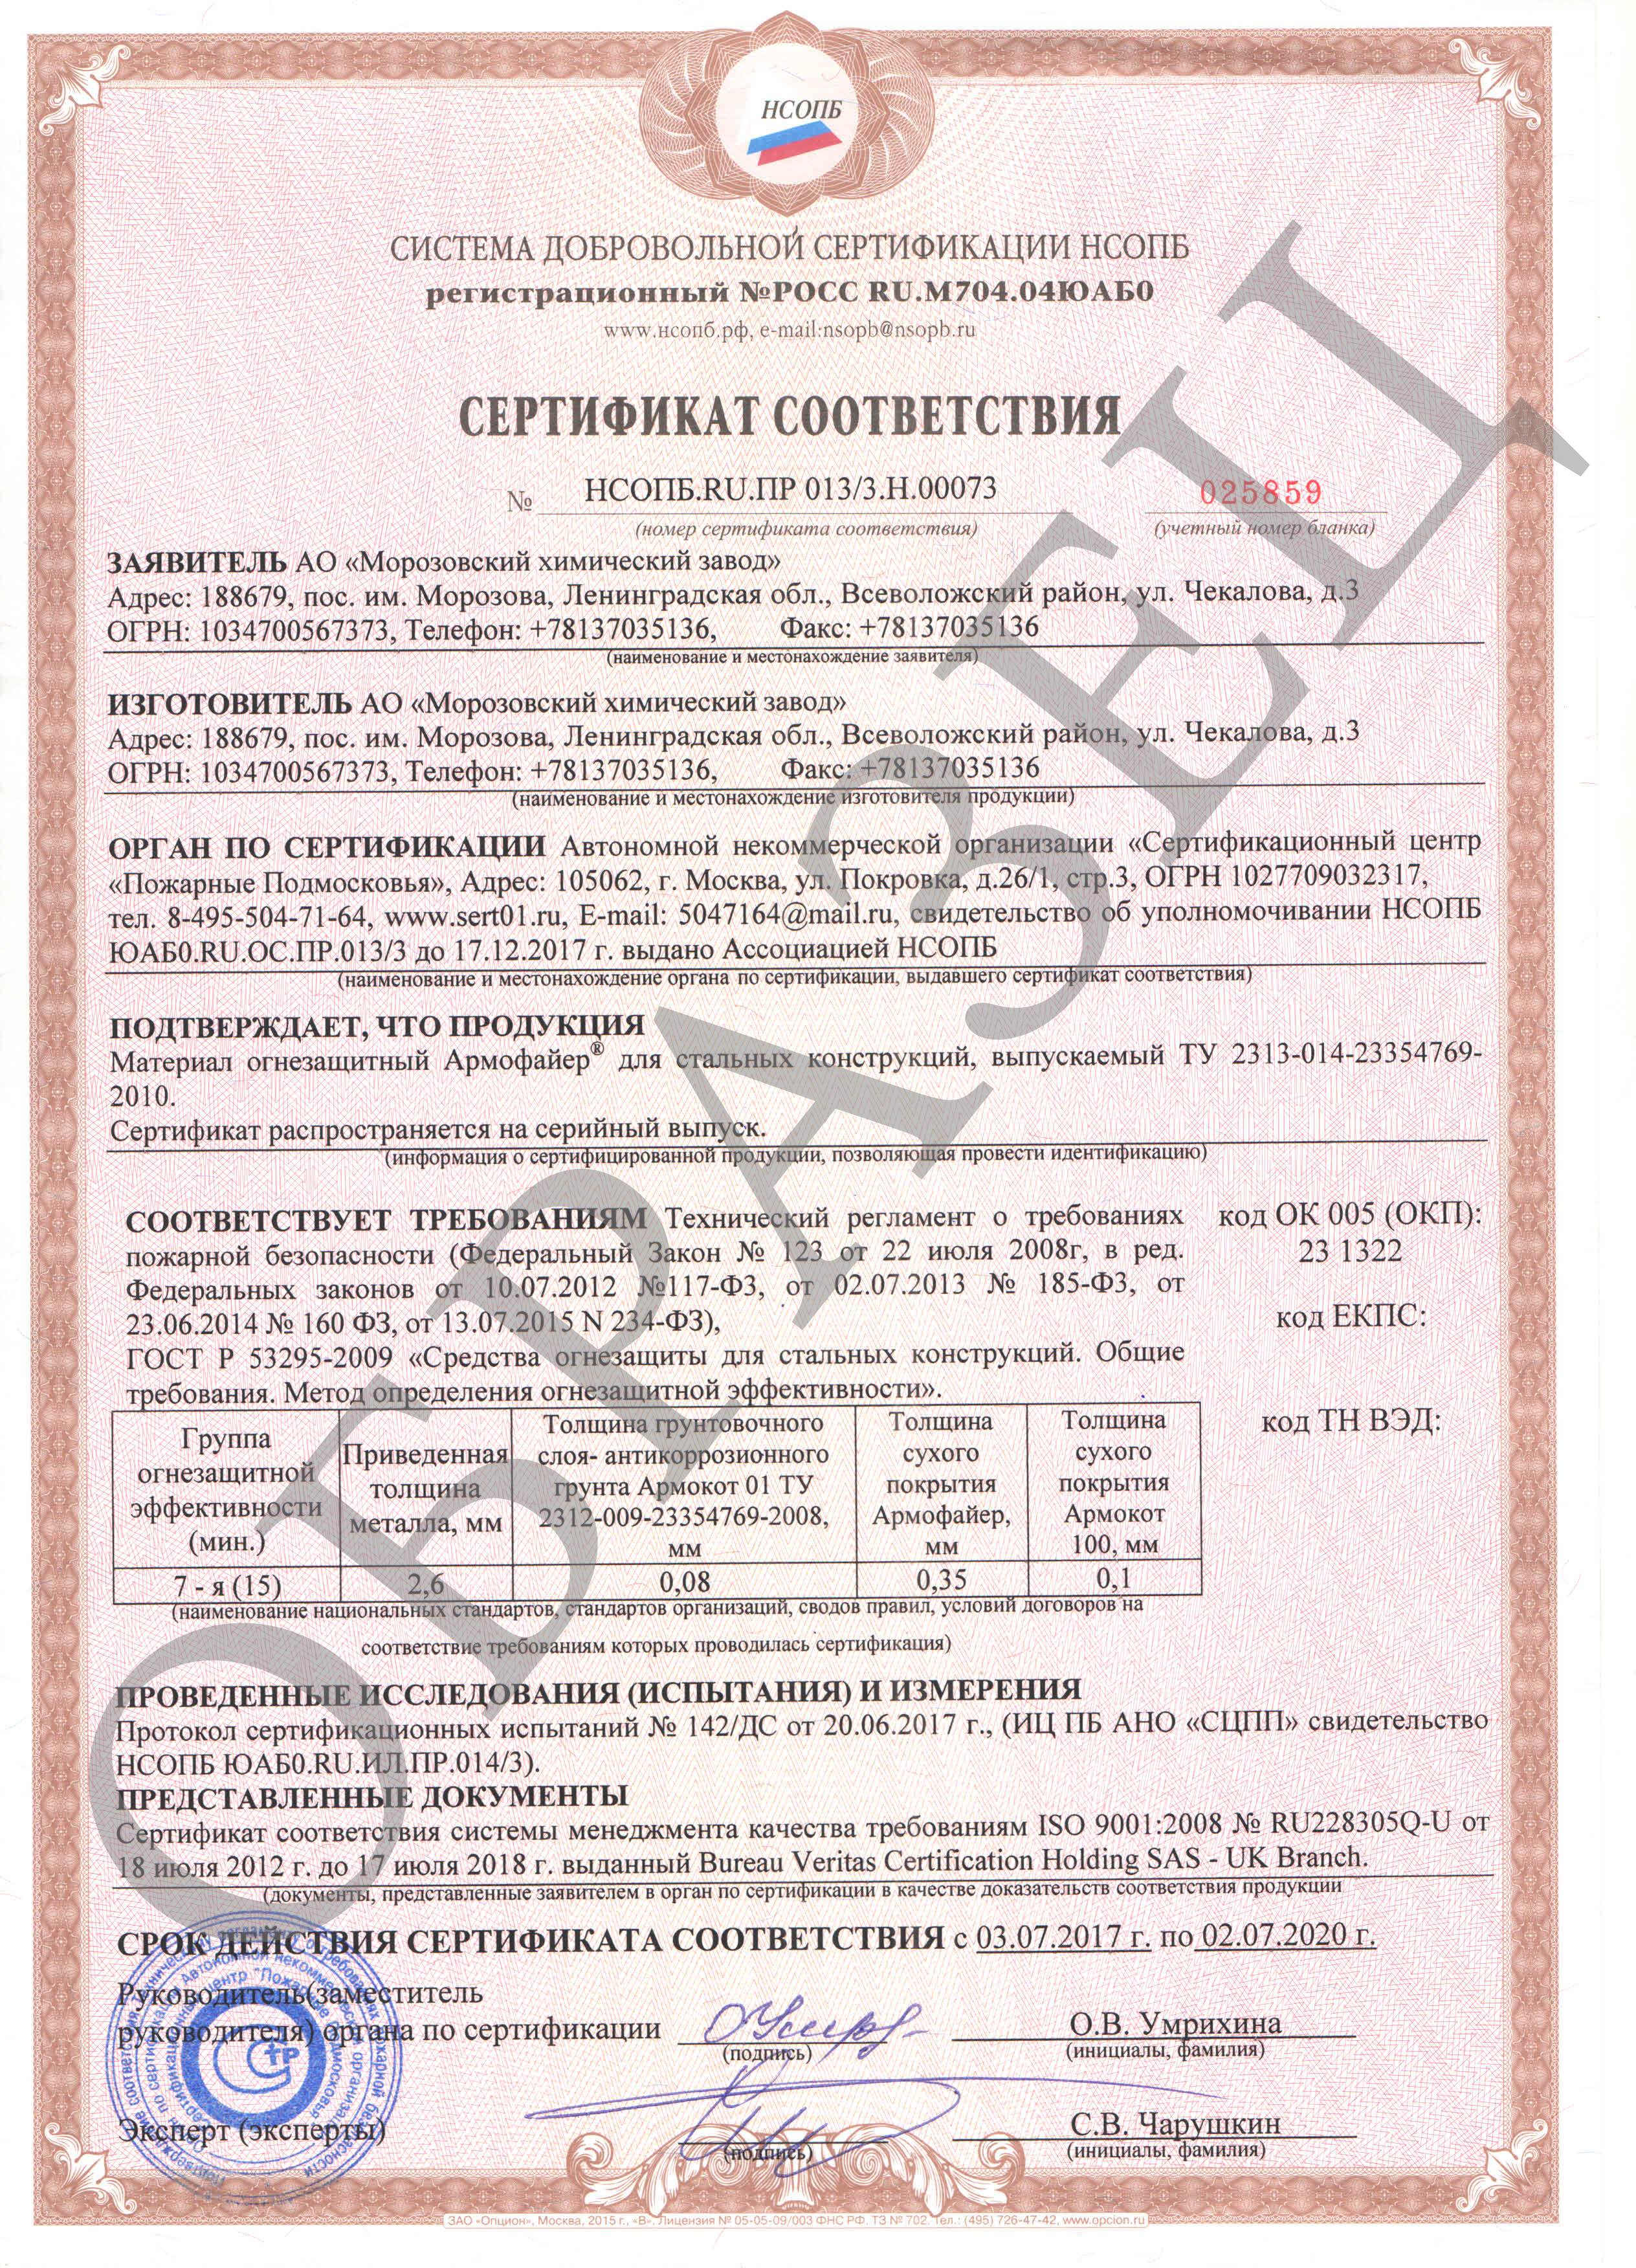 ПC 01+Армофайер+F100 R15 2,6мм